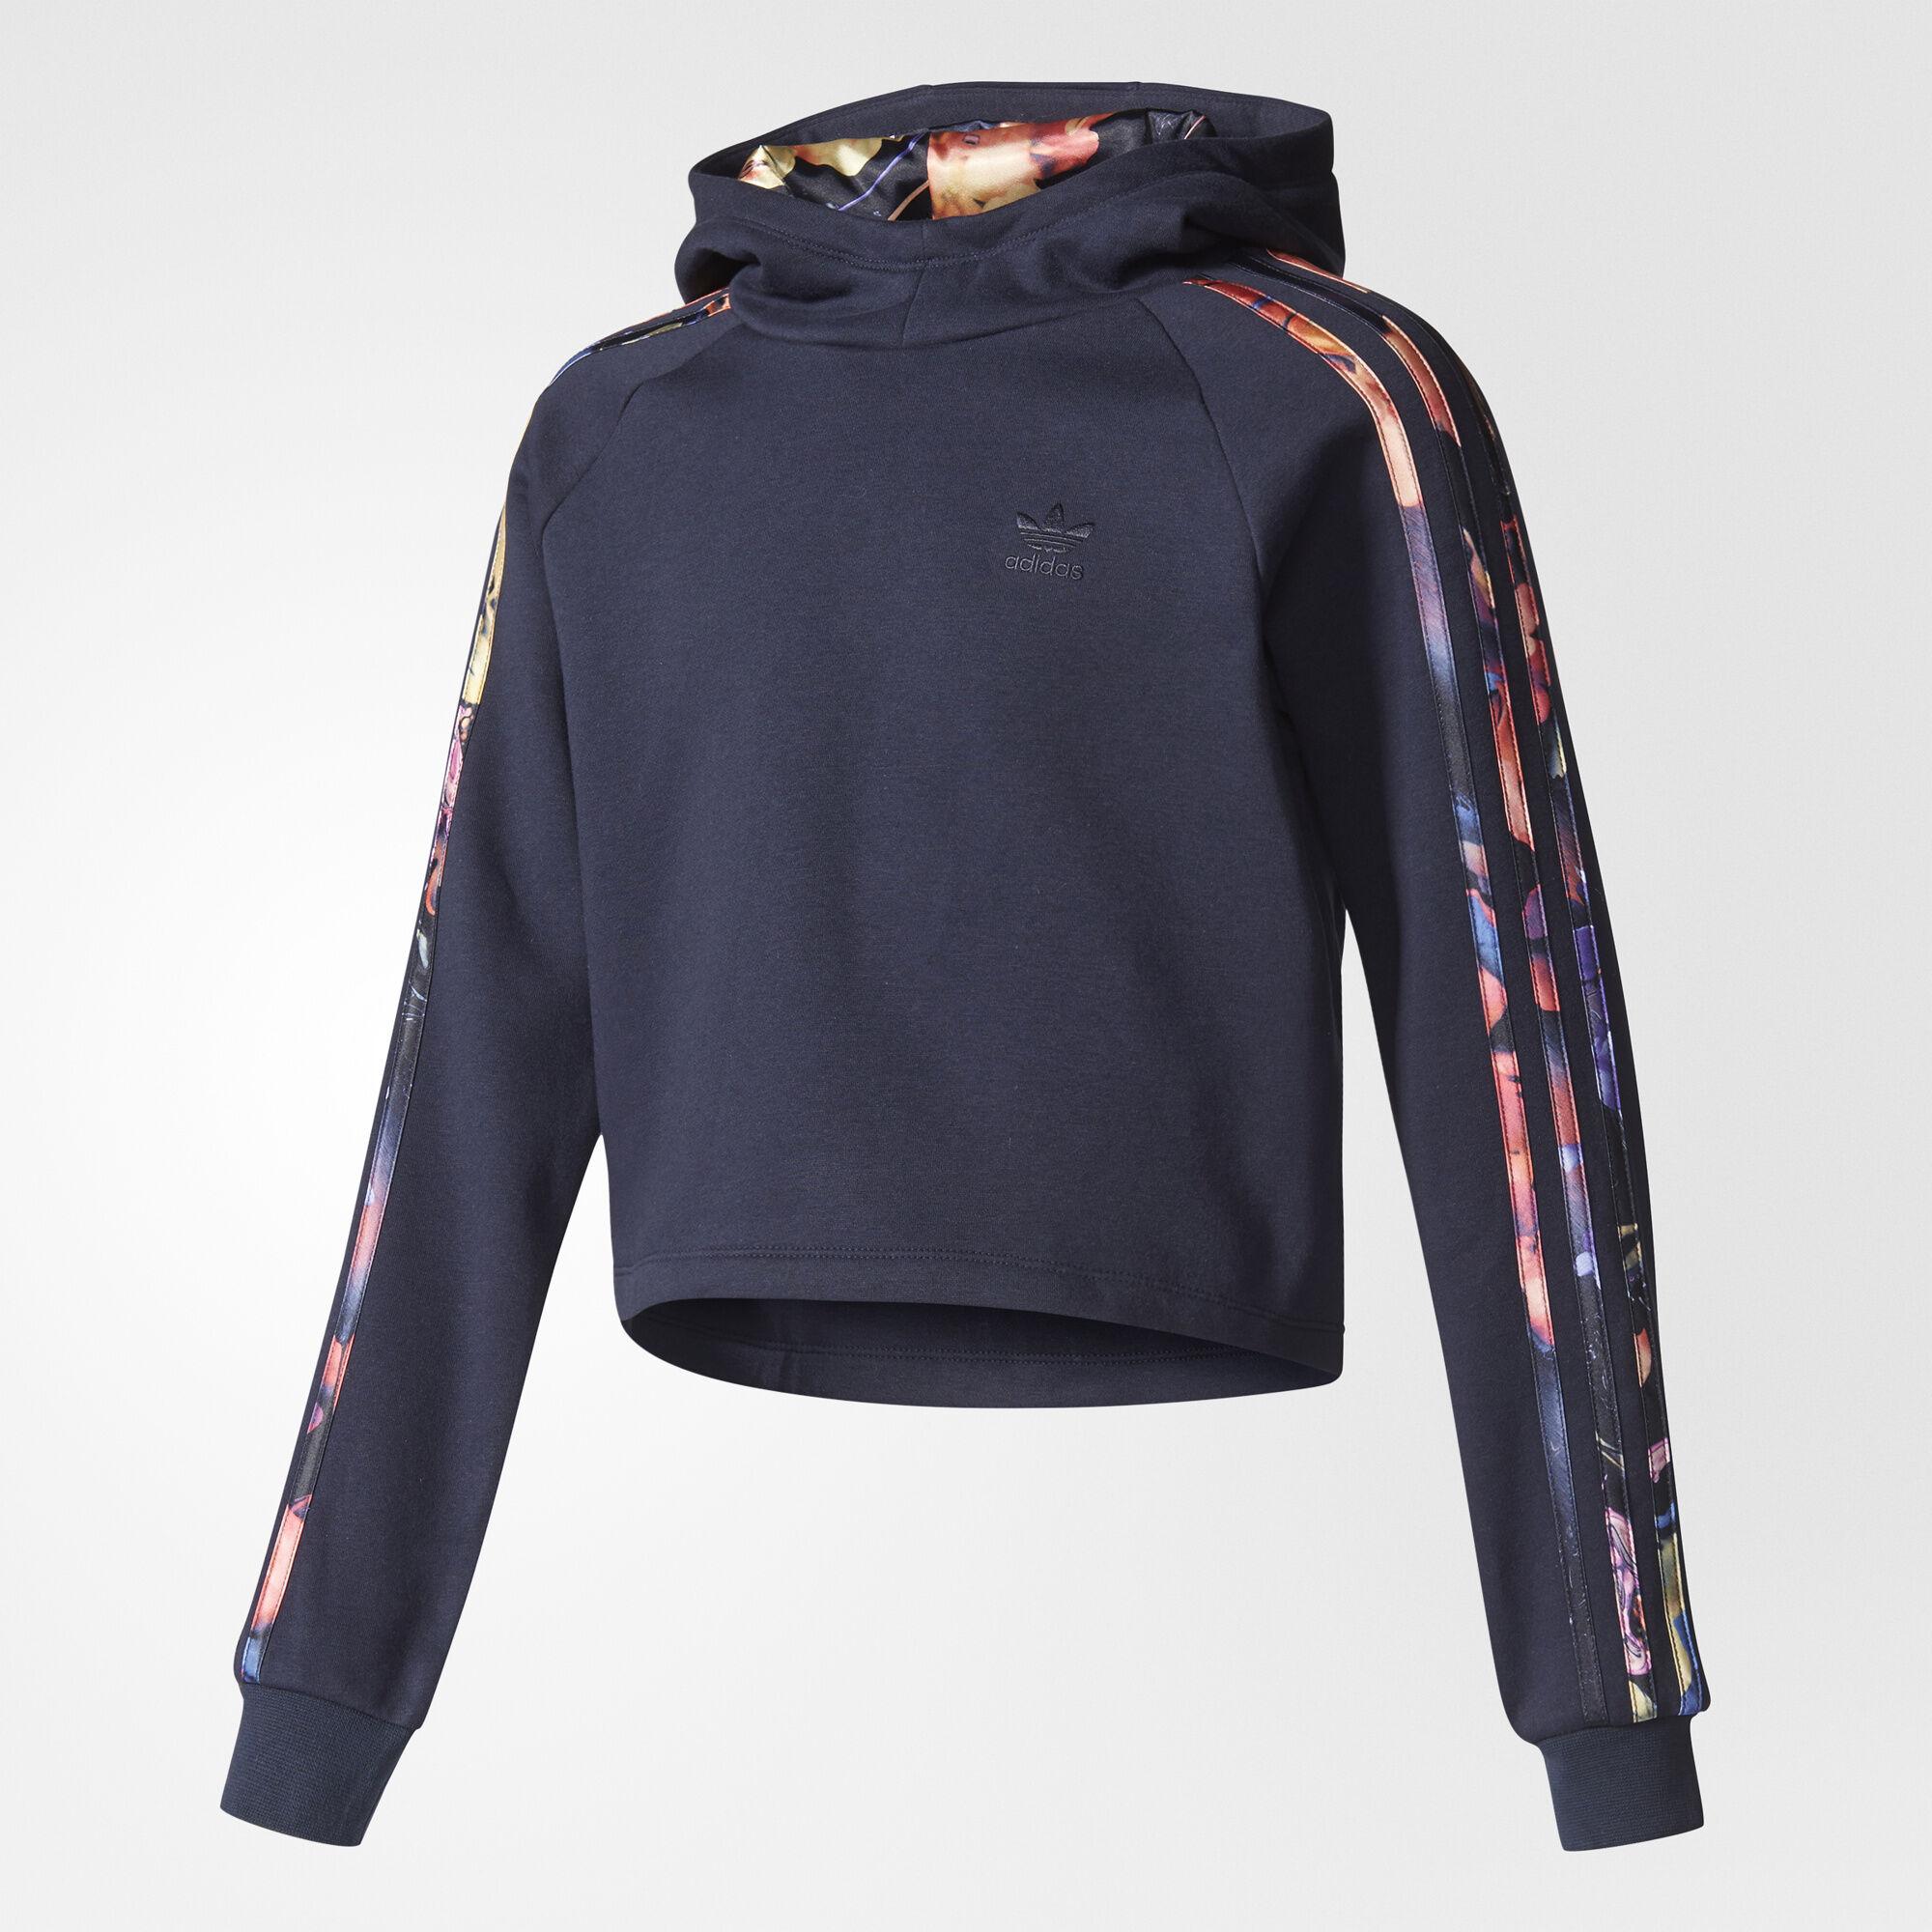 Buy adidas sweatshirt mens purple >off54%)